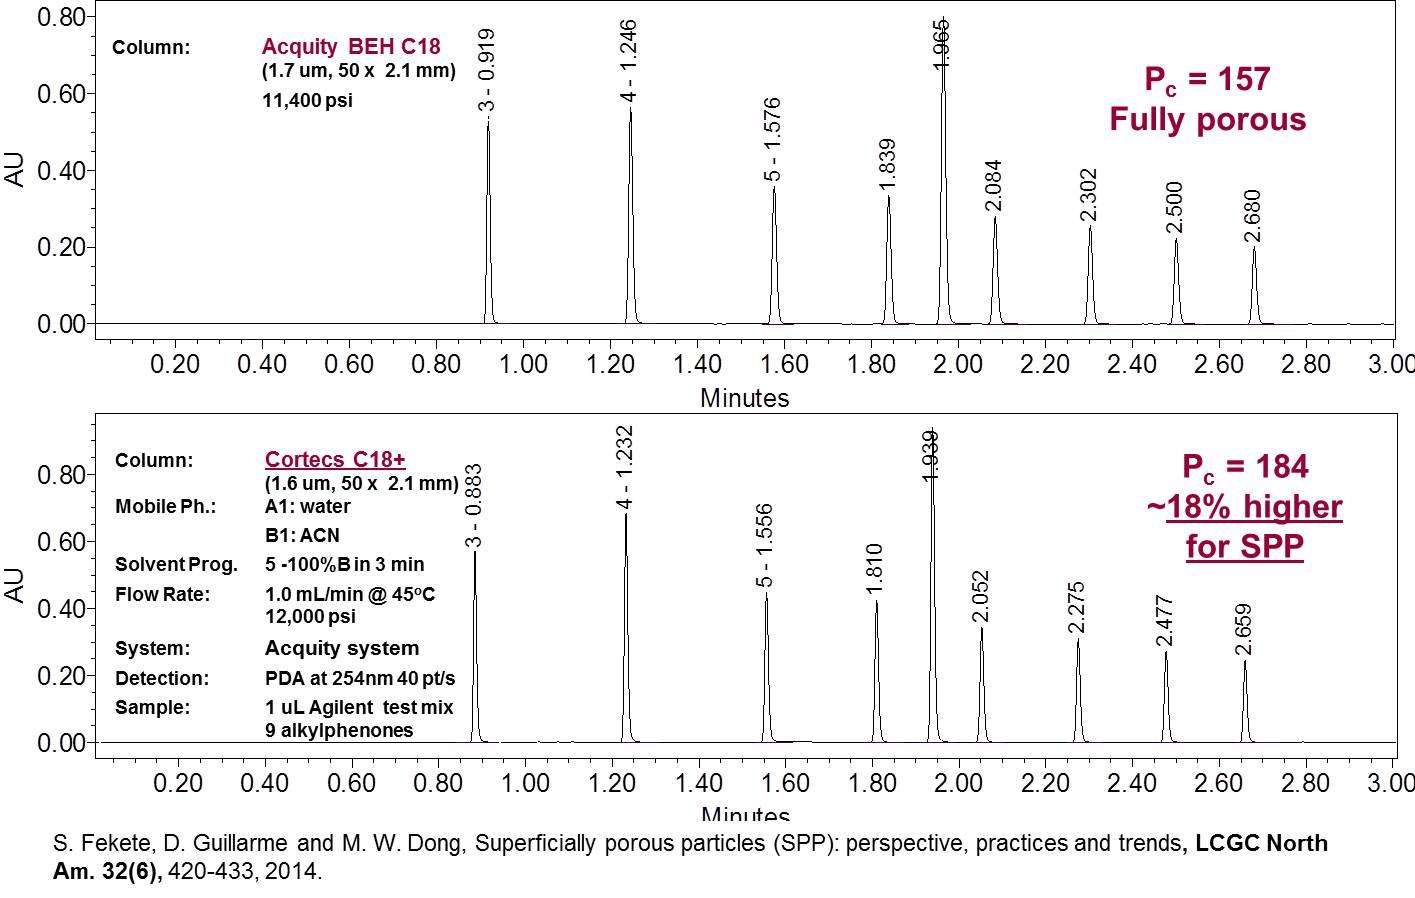 Comparison of fast UHPLC